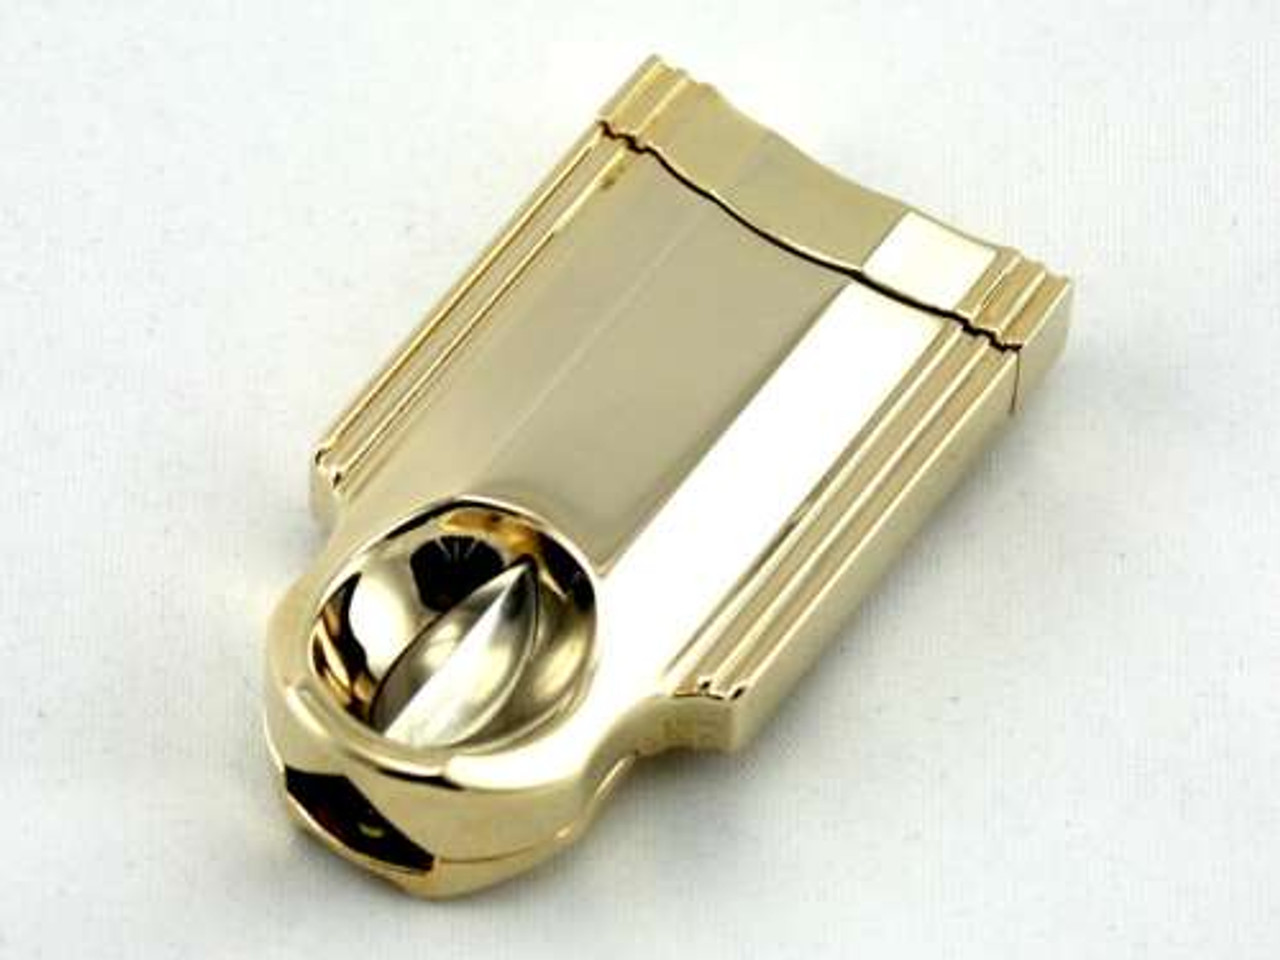 Gold Lamont Cigar V Cutter